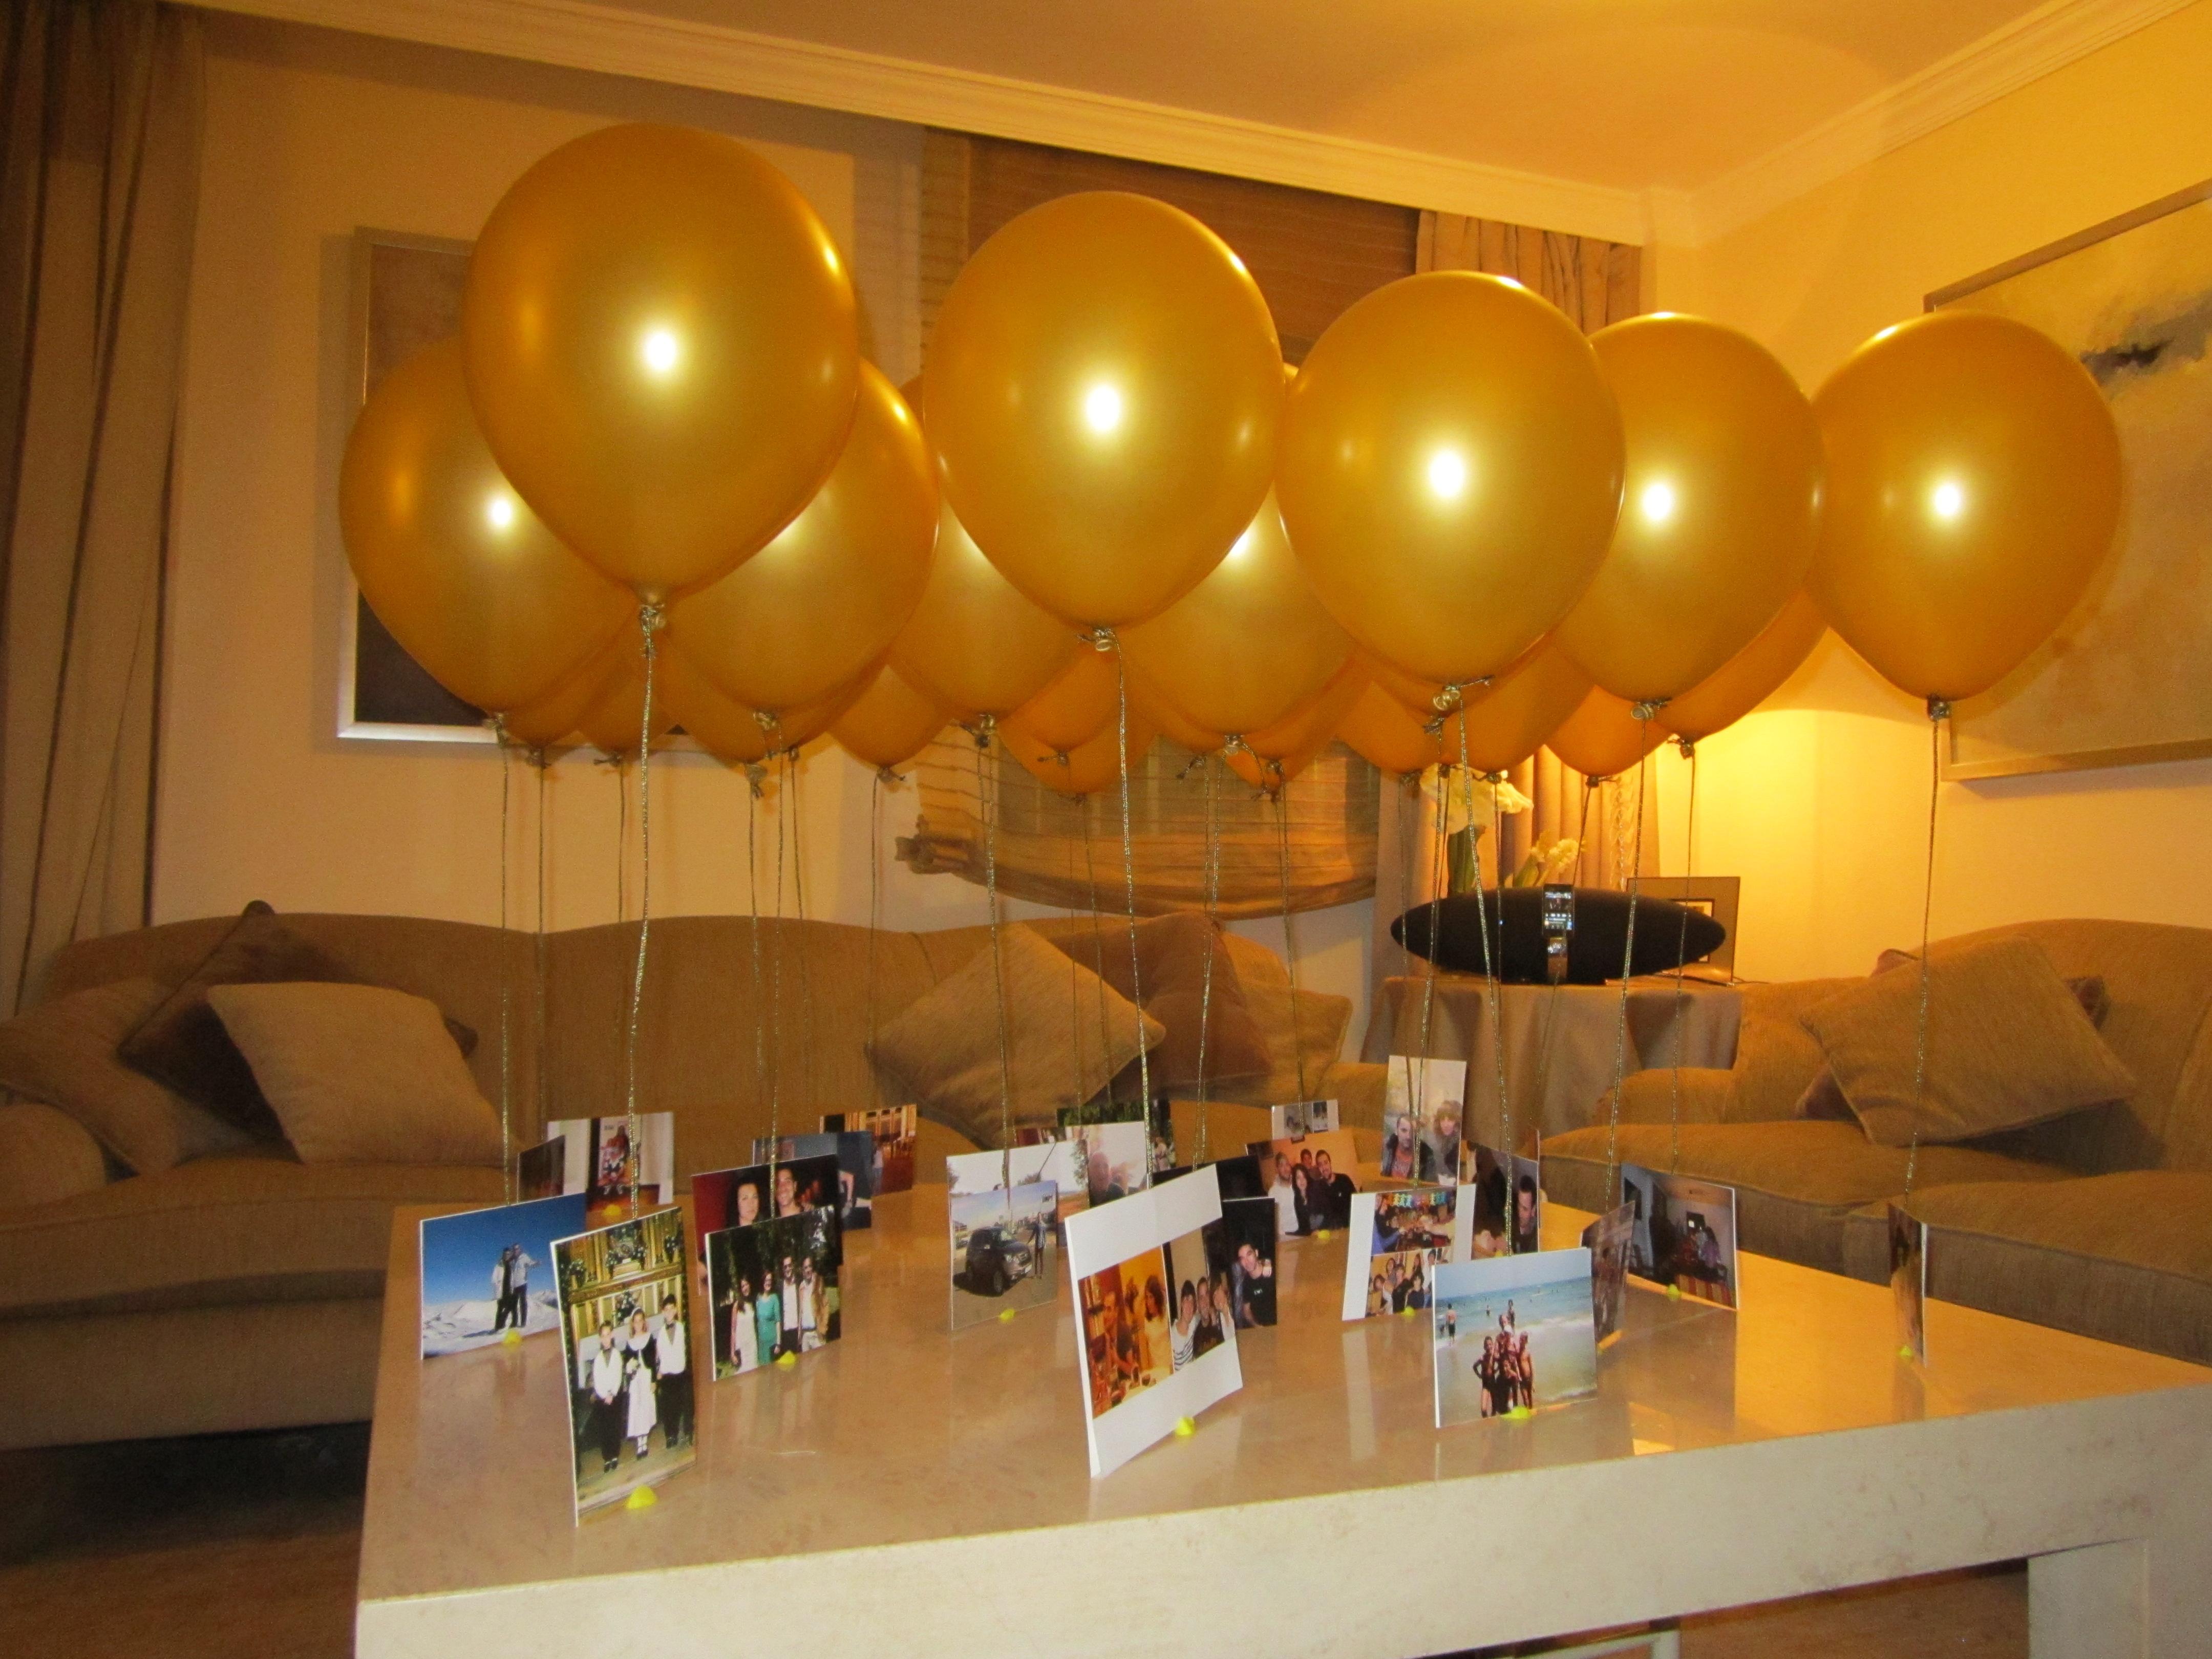 Sorpresas para tu novio imagui for Sorpresas para aniversario